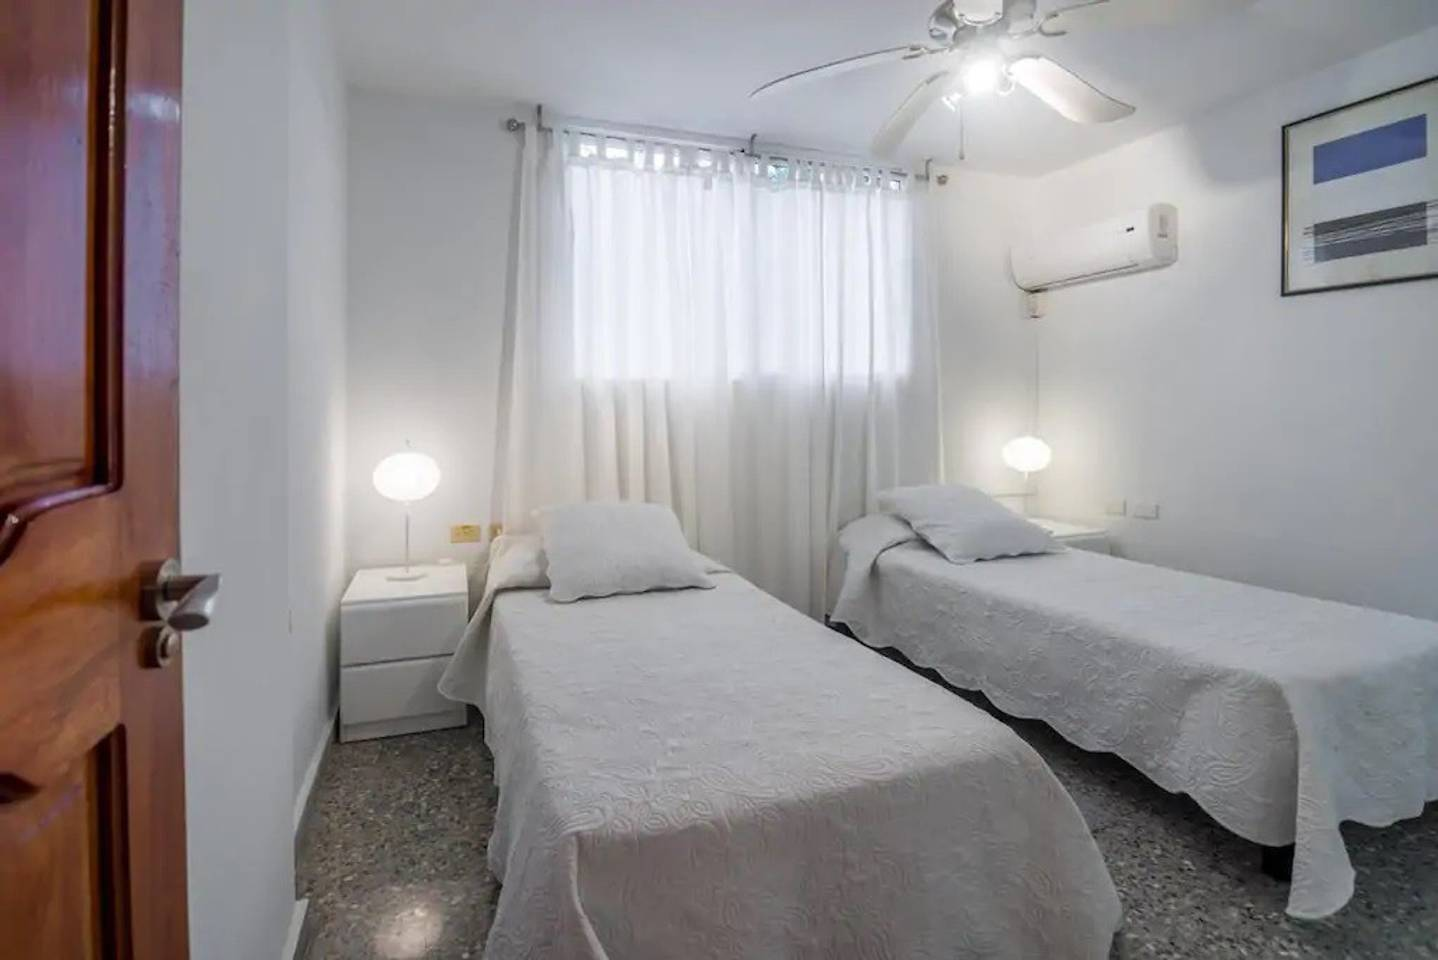 Apartment Villa Don Teto 8 Rooms  Luxury   Great Havana View photo 23332341